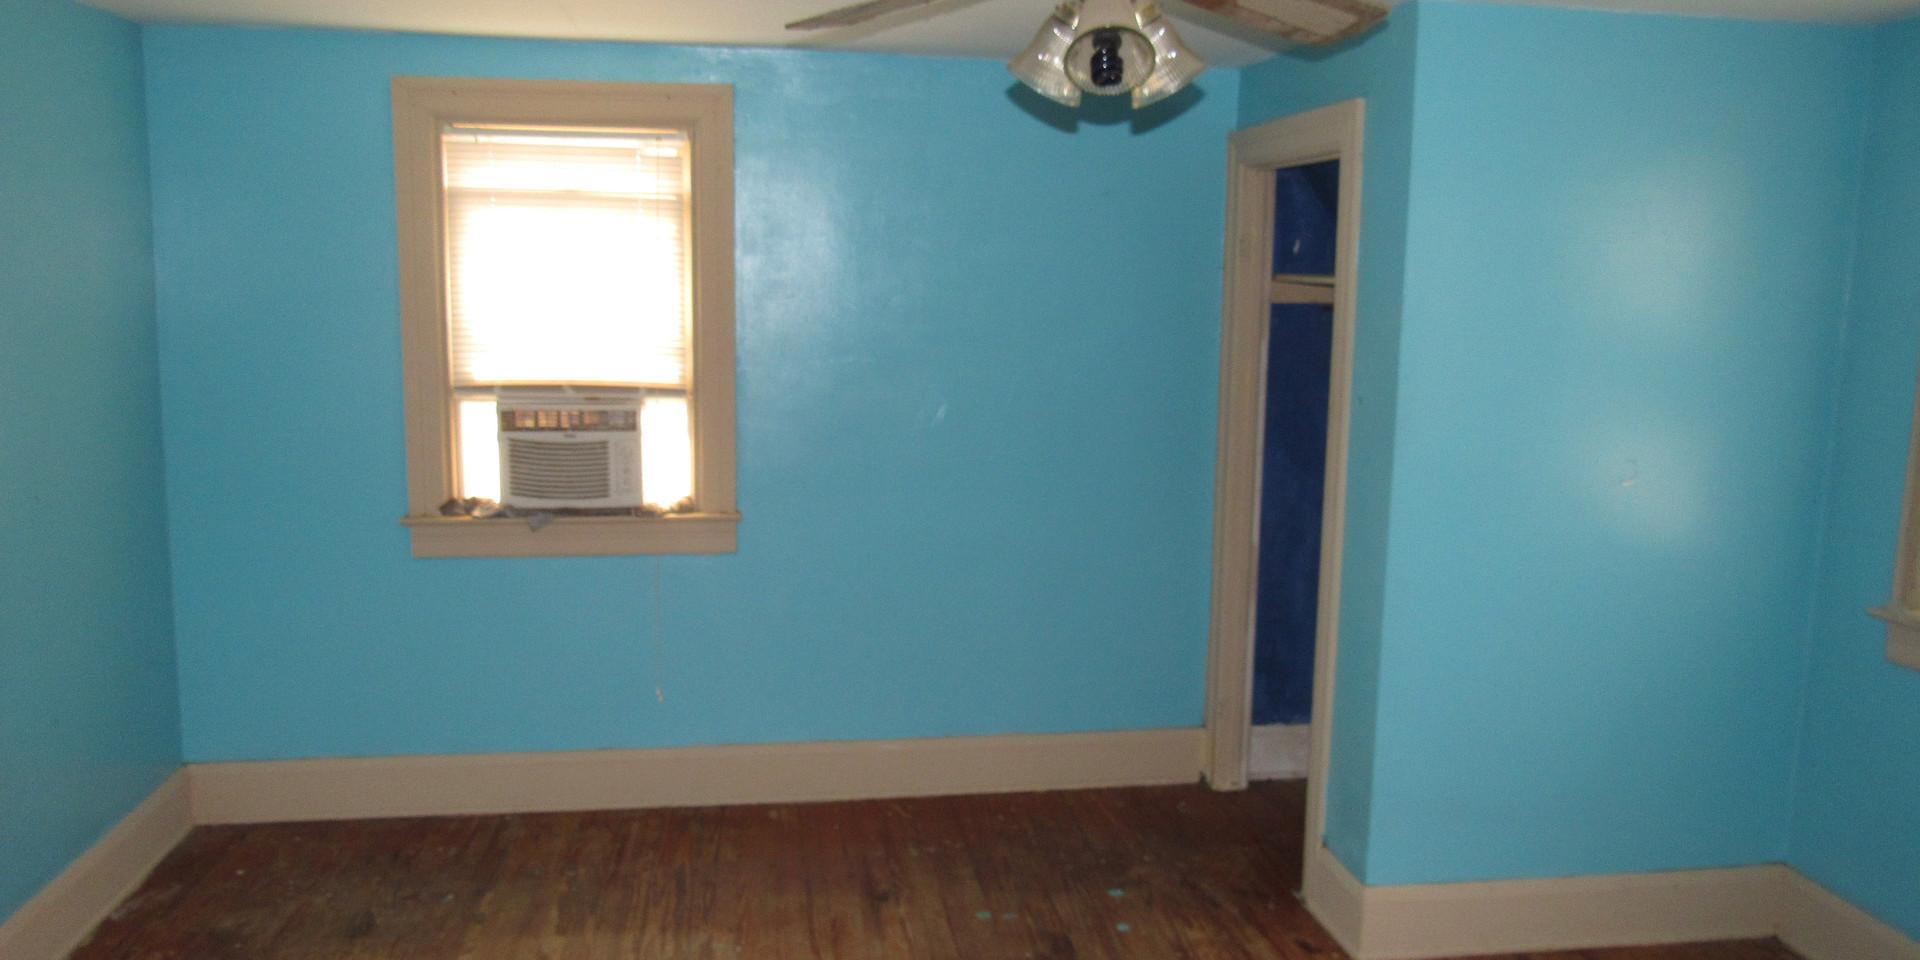 25 - Bedroom 2.JPG